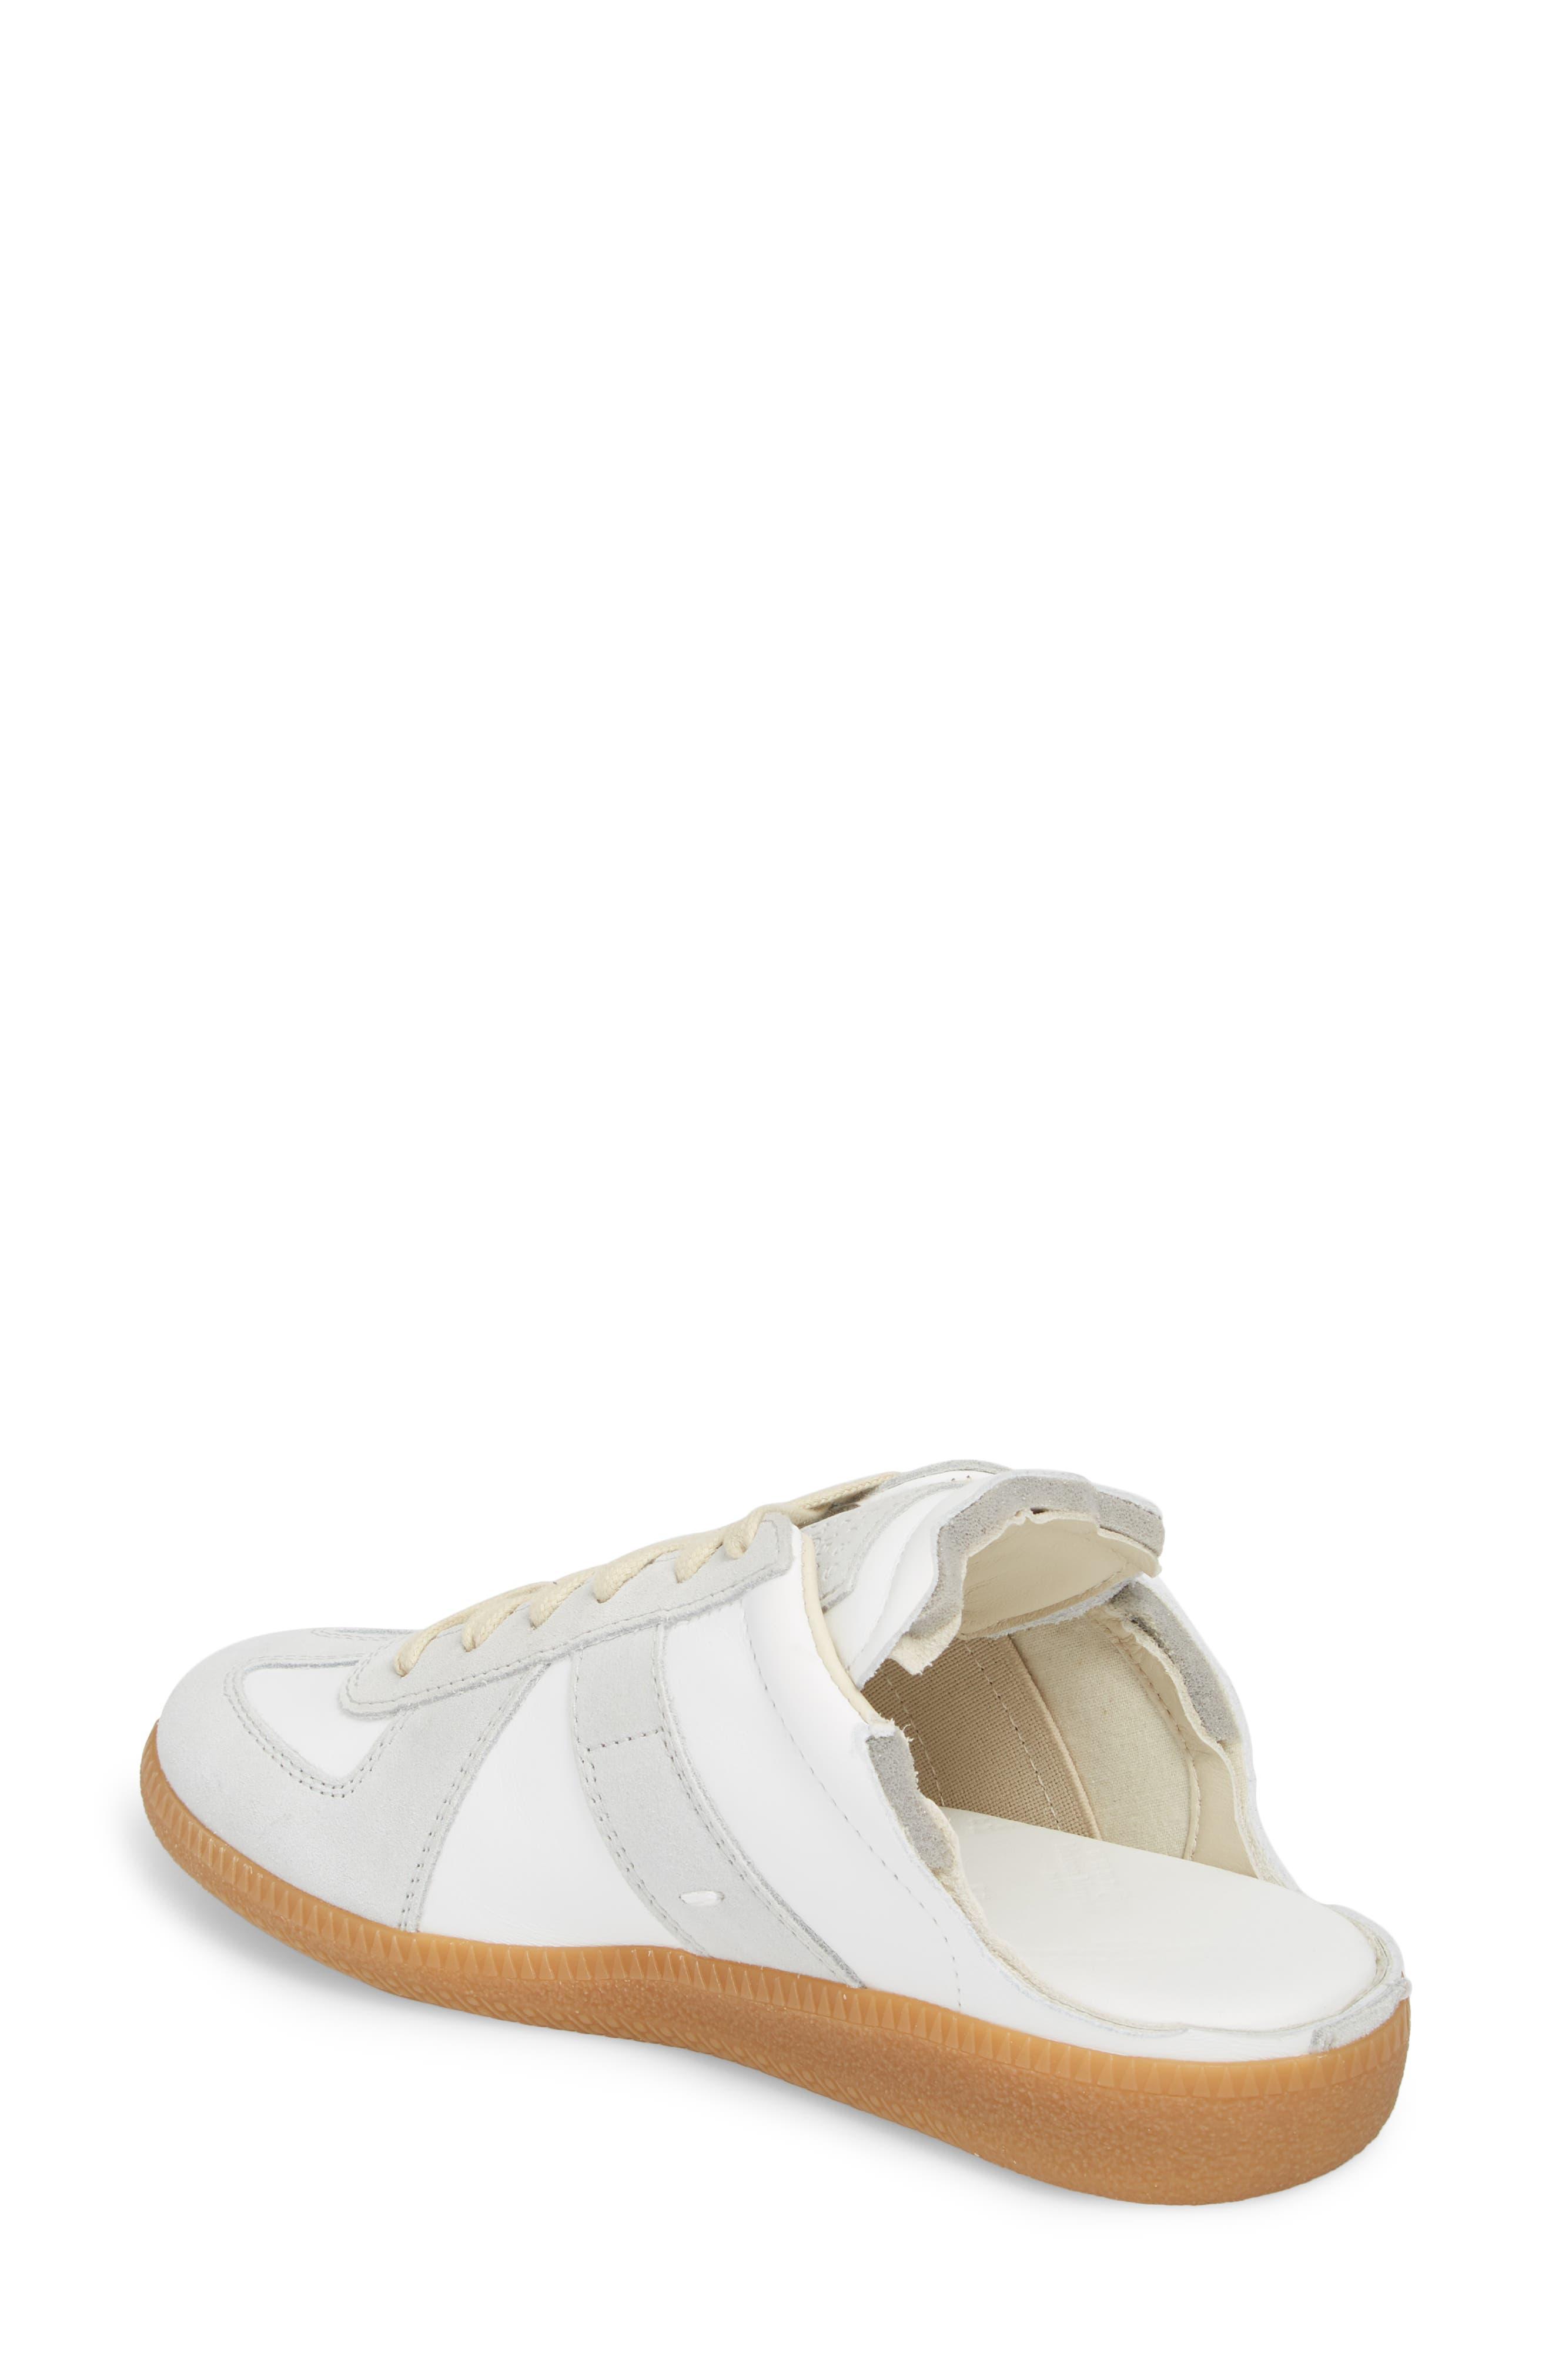 Replica Sneaker Mule,                             Alternate thumbnail 2, color,                             Amber/ White